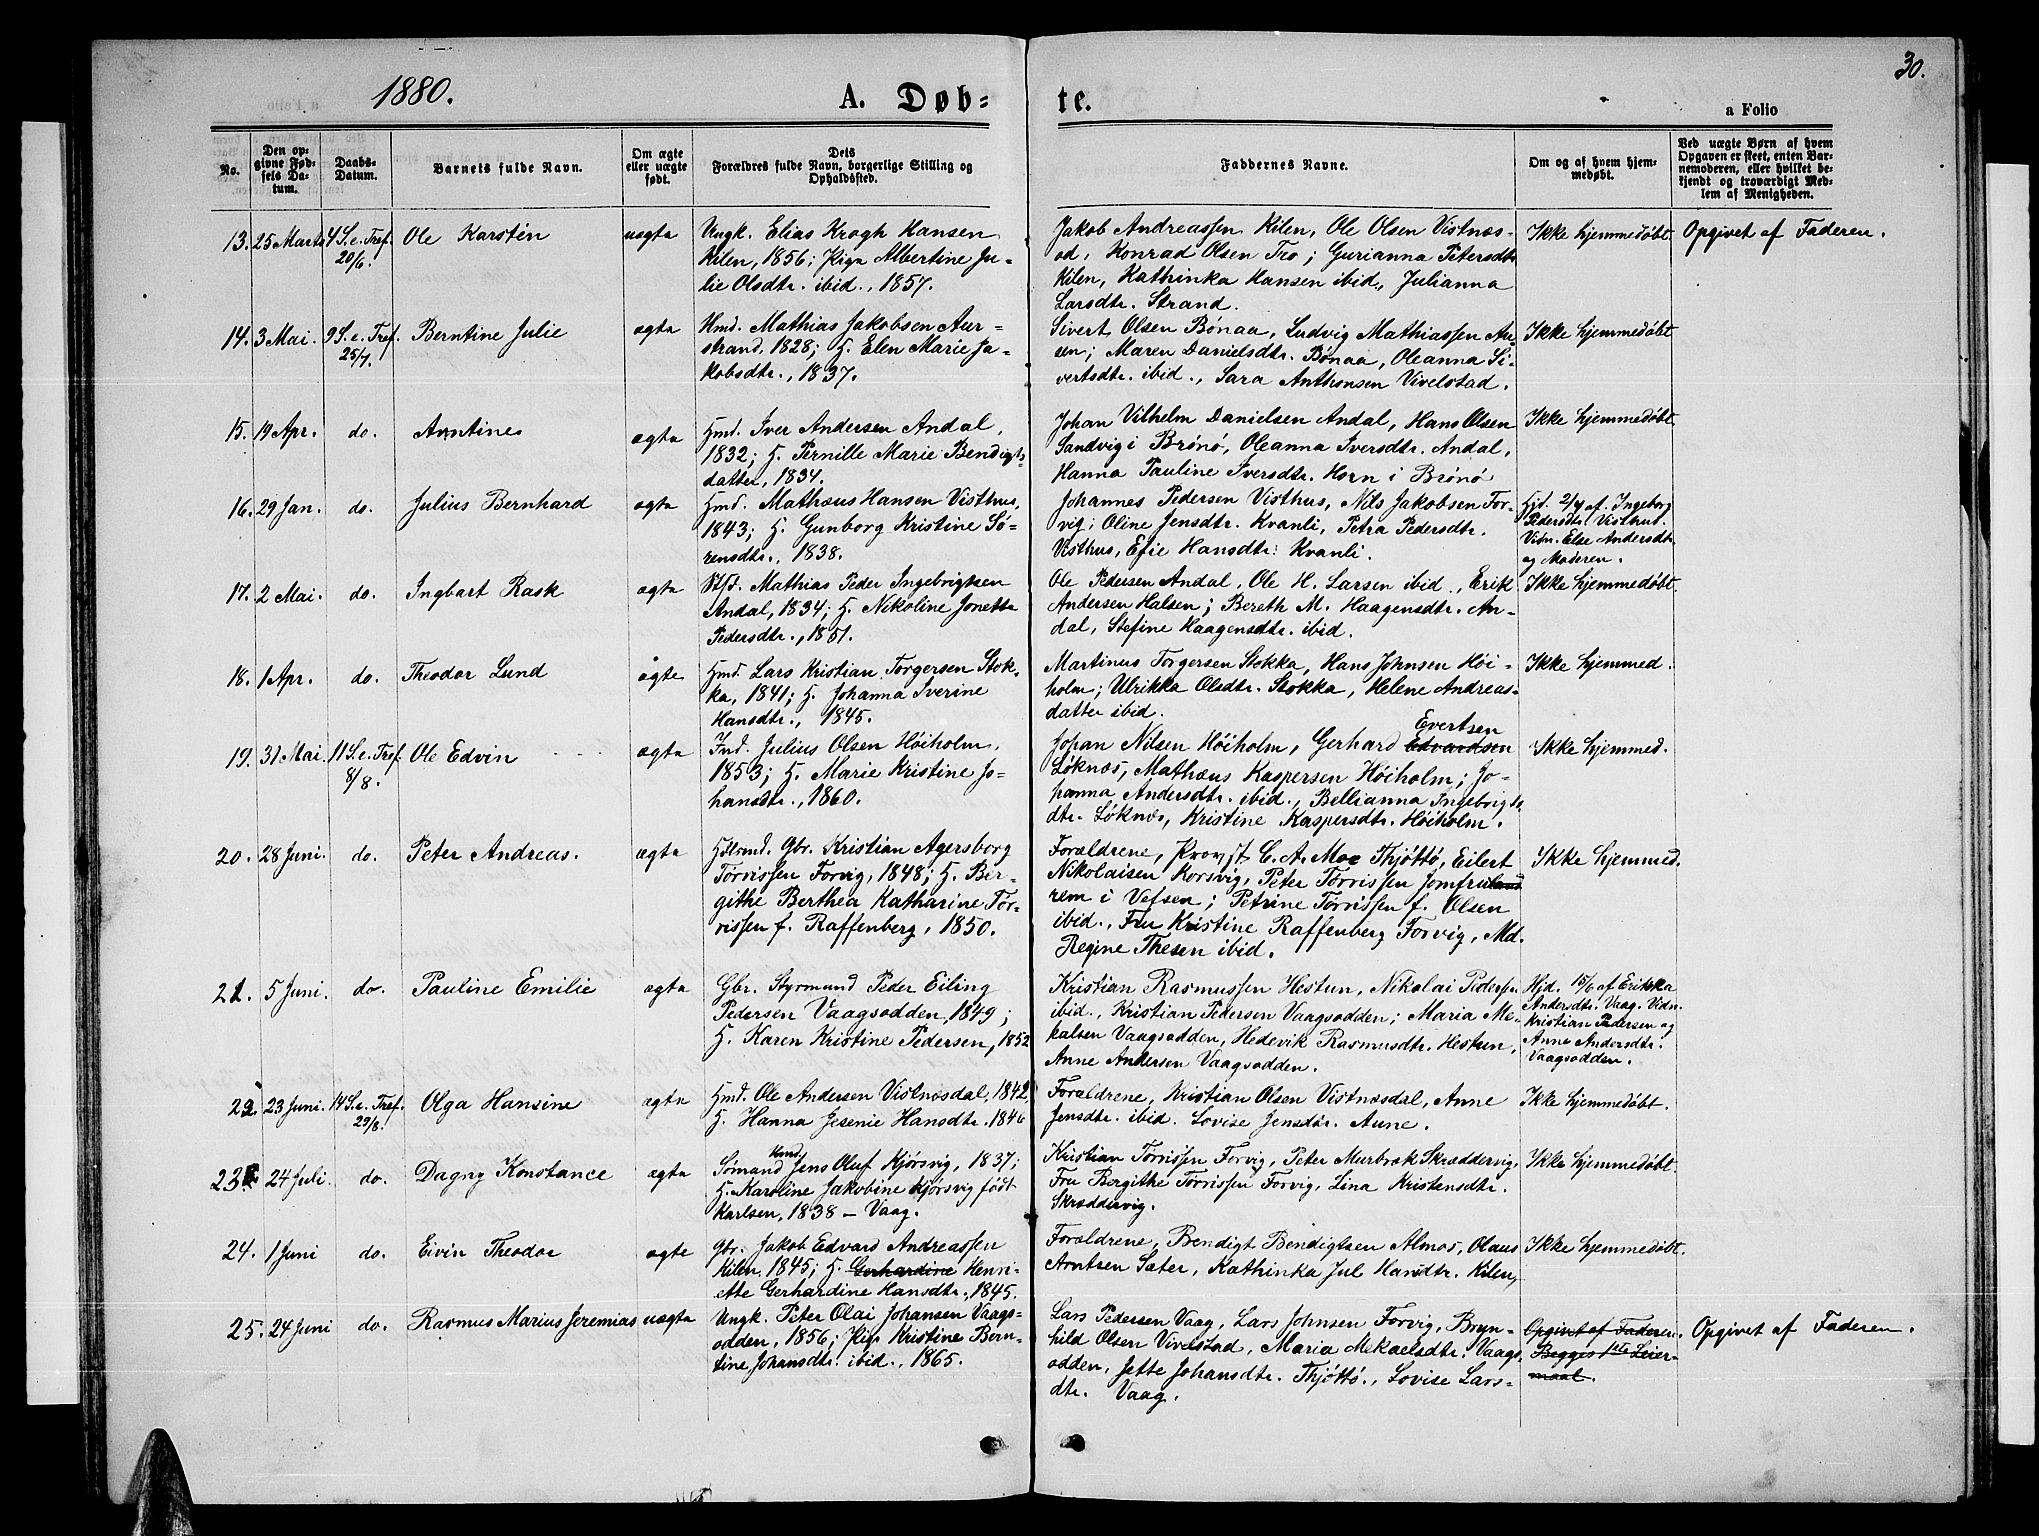 SAT, Ministerialprotokoller, klokkerbøker og fødselsregistre - Nordland, 819/L0276: Klokkerbok nr. 819C02, 1869-1887, s. 30